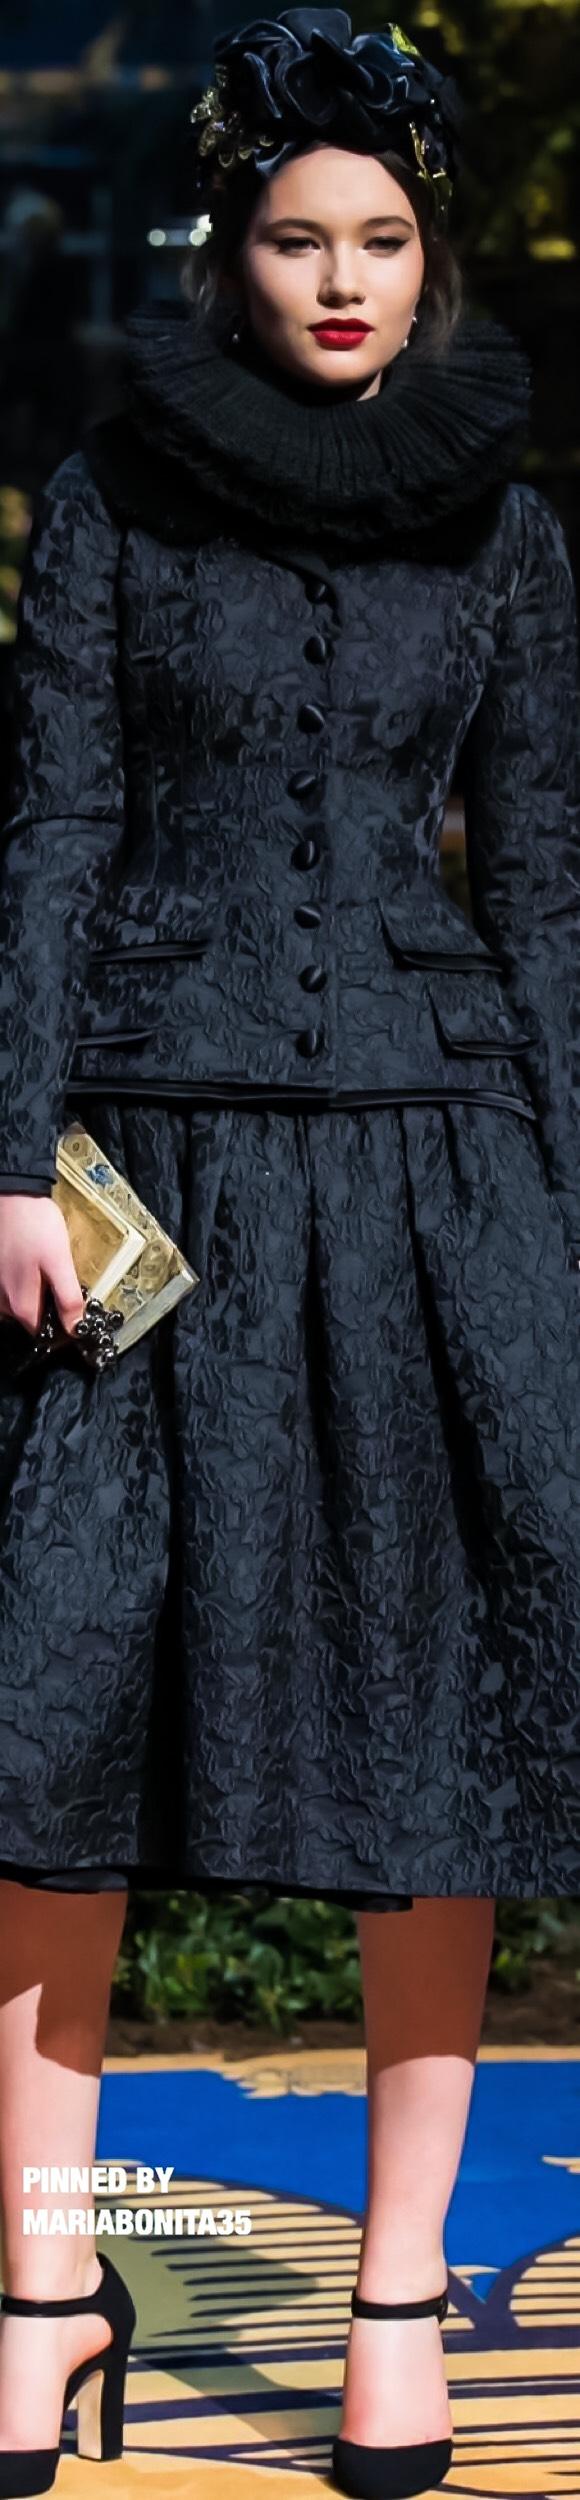 Dolce & Gabbana Haute Couture SS17